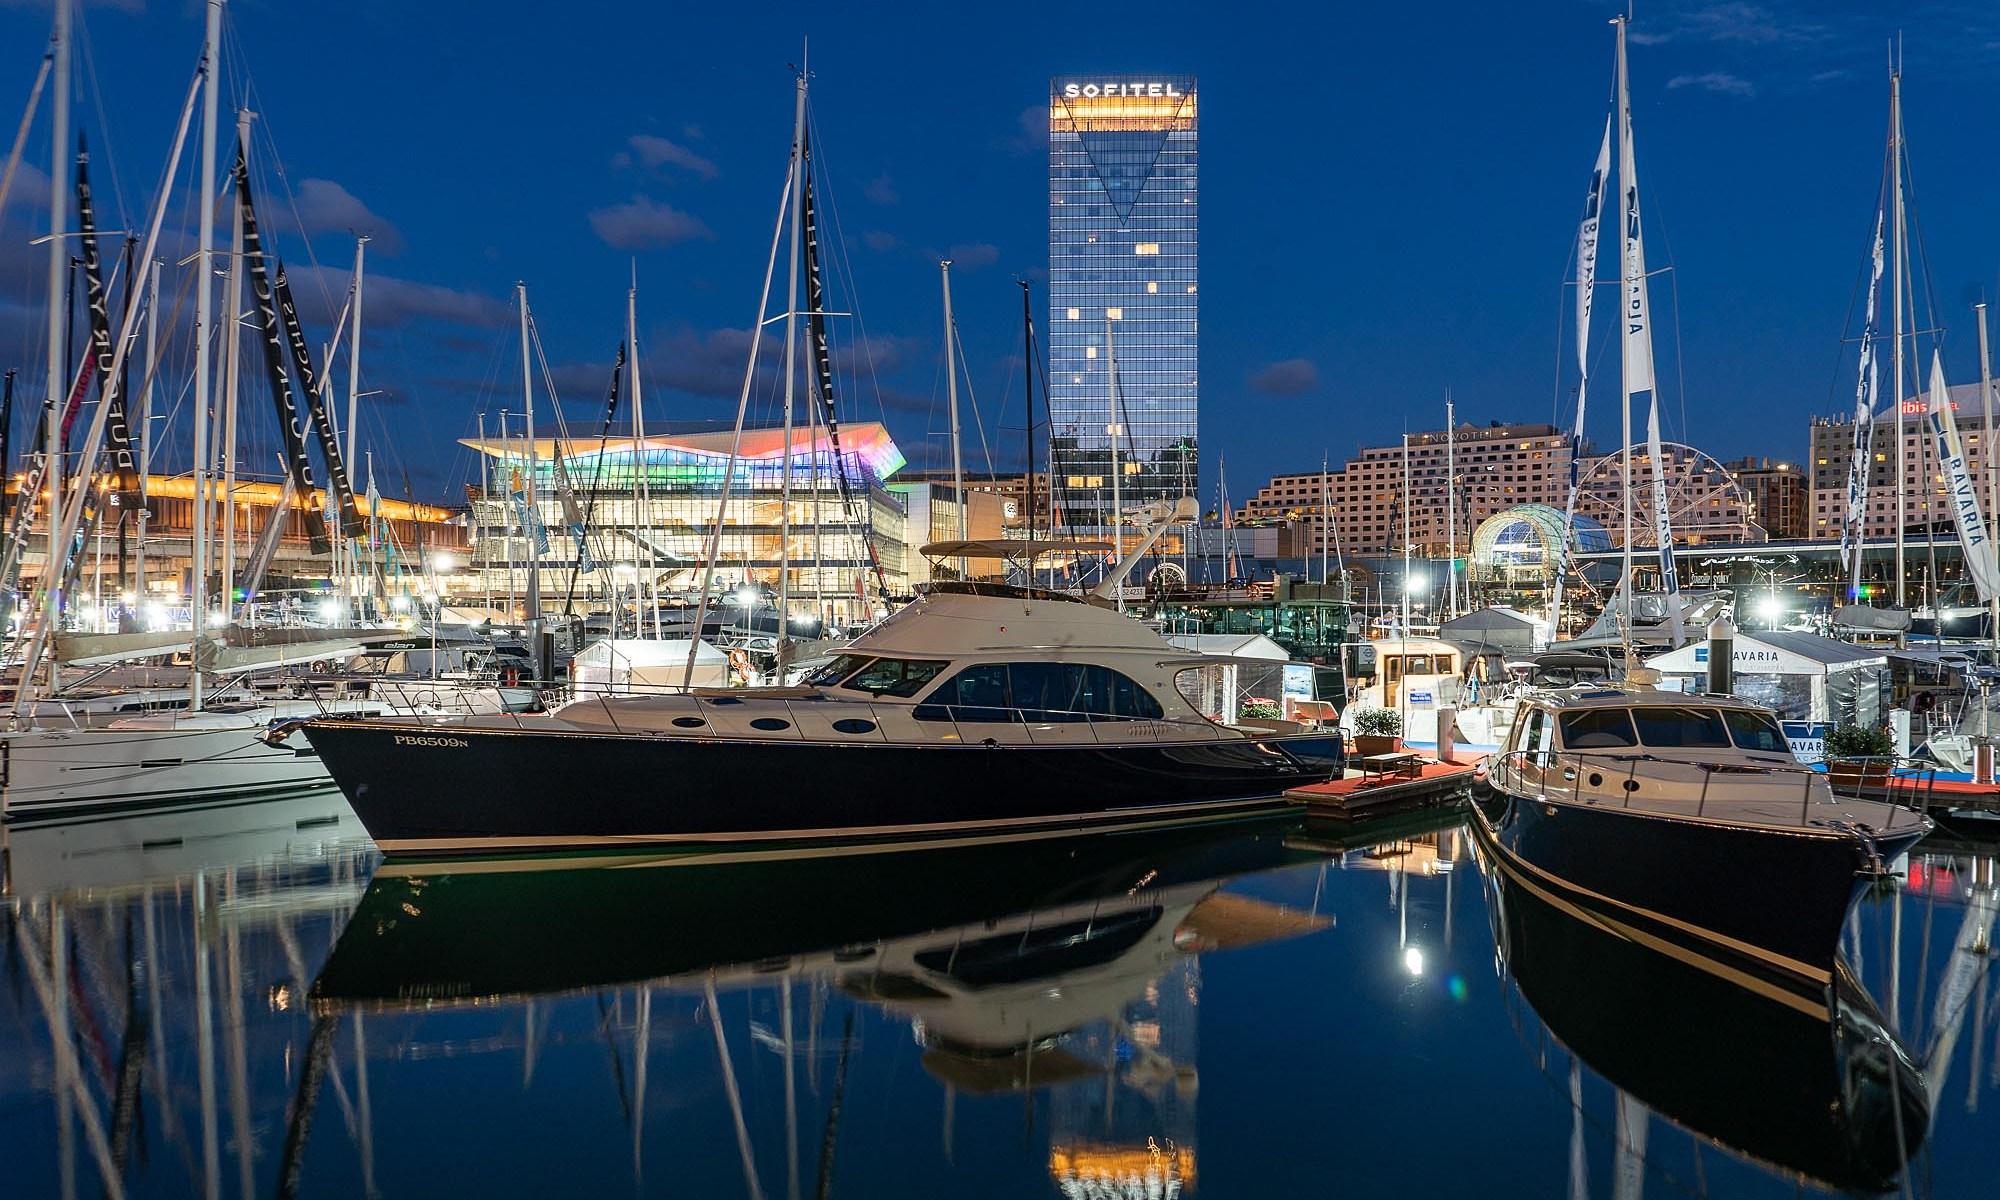 International Boat Show, Darling Harbour